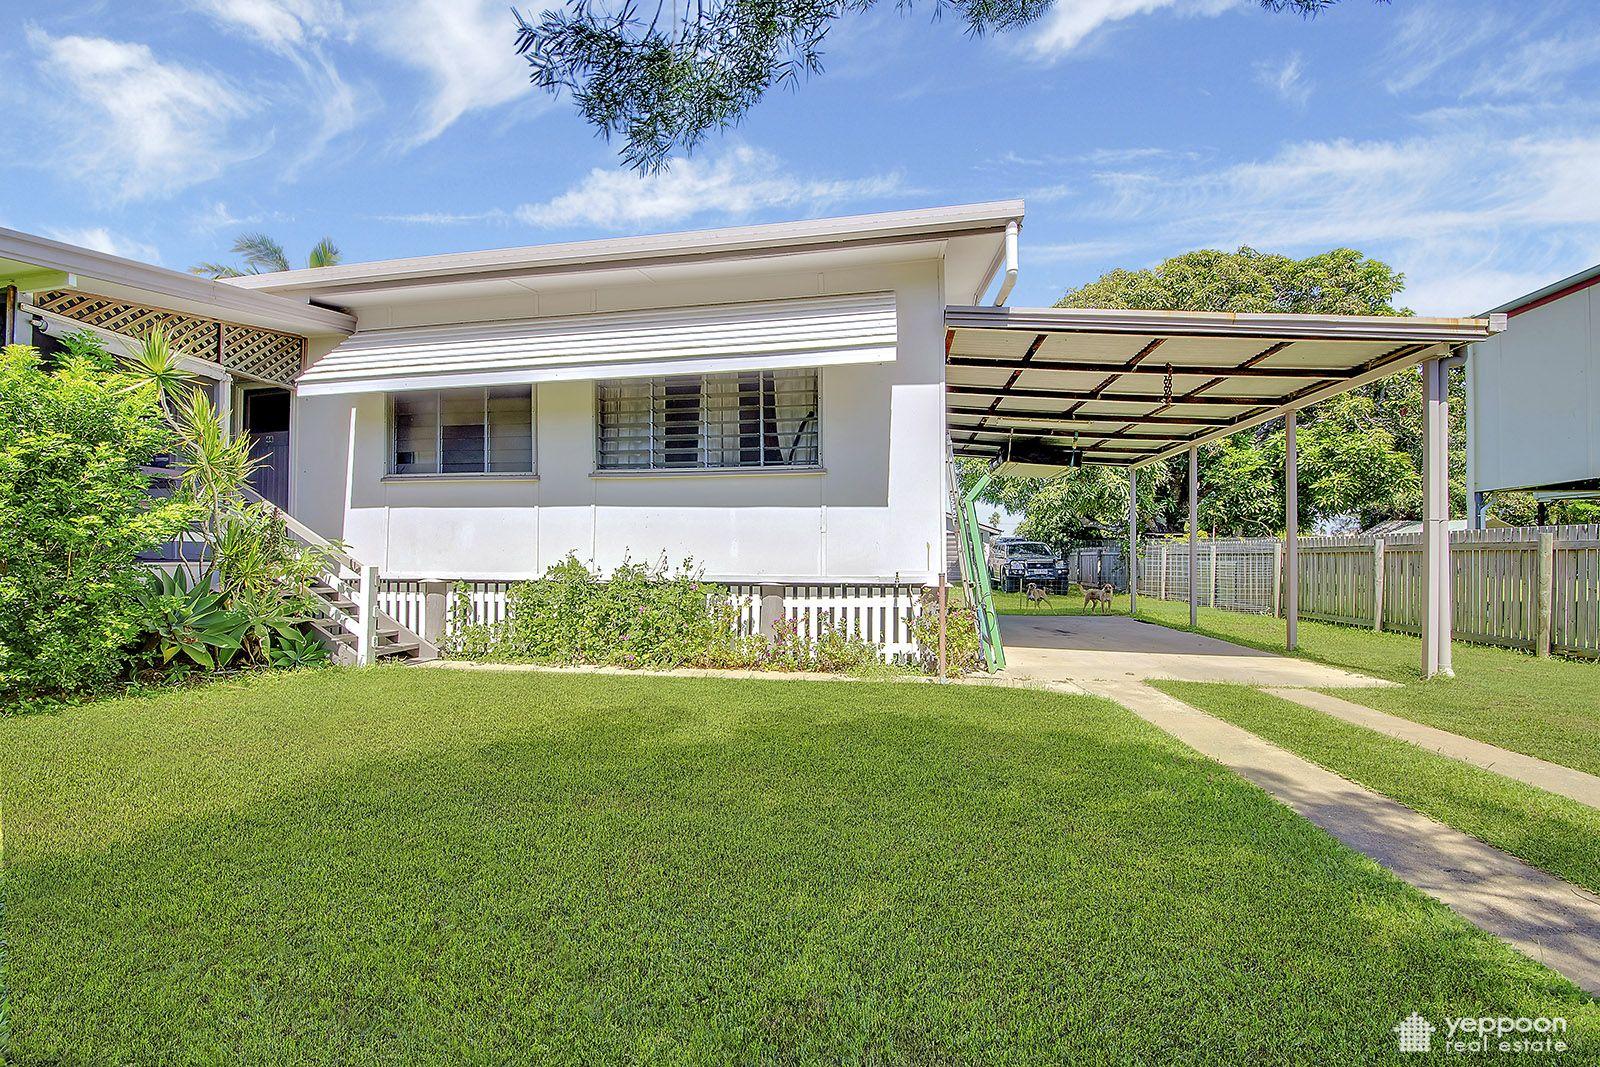 44 William Street, Yeppoon QLD 4703, Image 0